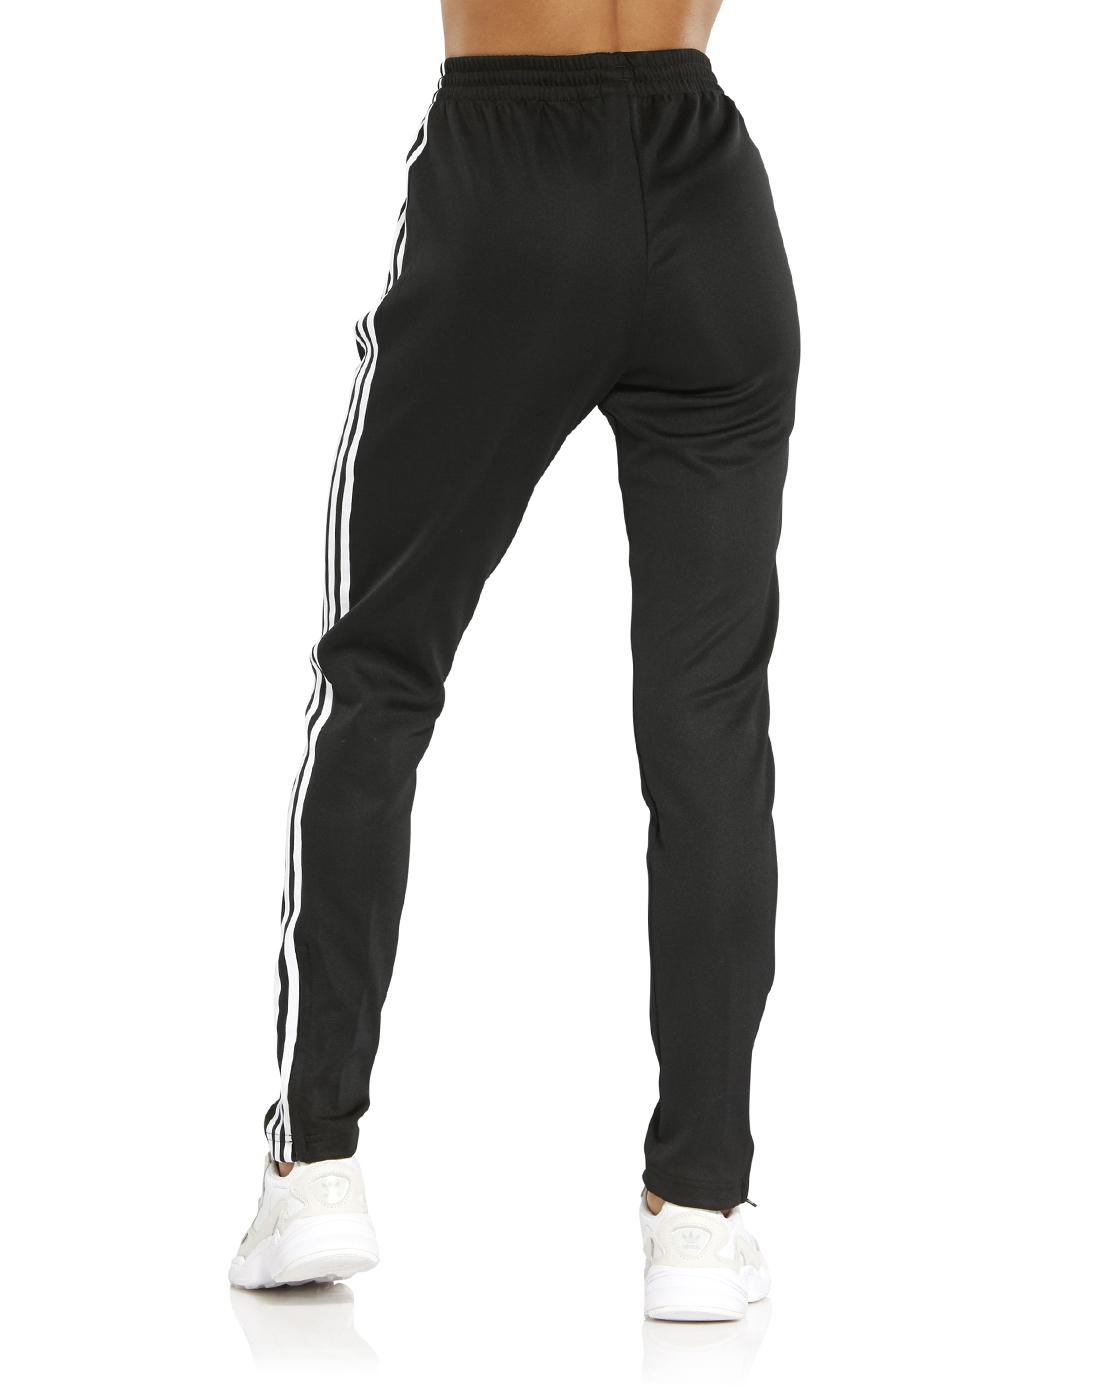 927d6336016 adidas Originals Womens Superstar Track Pants | Life Style Sports